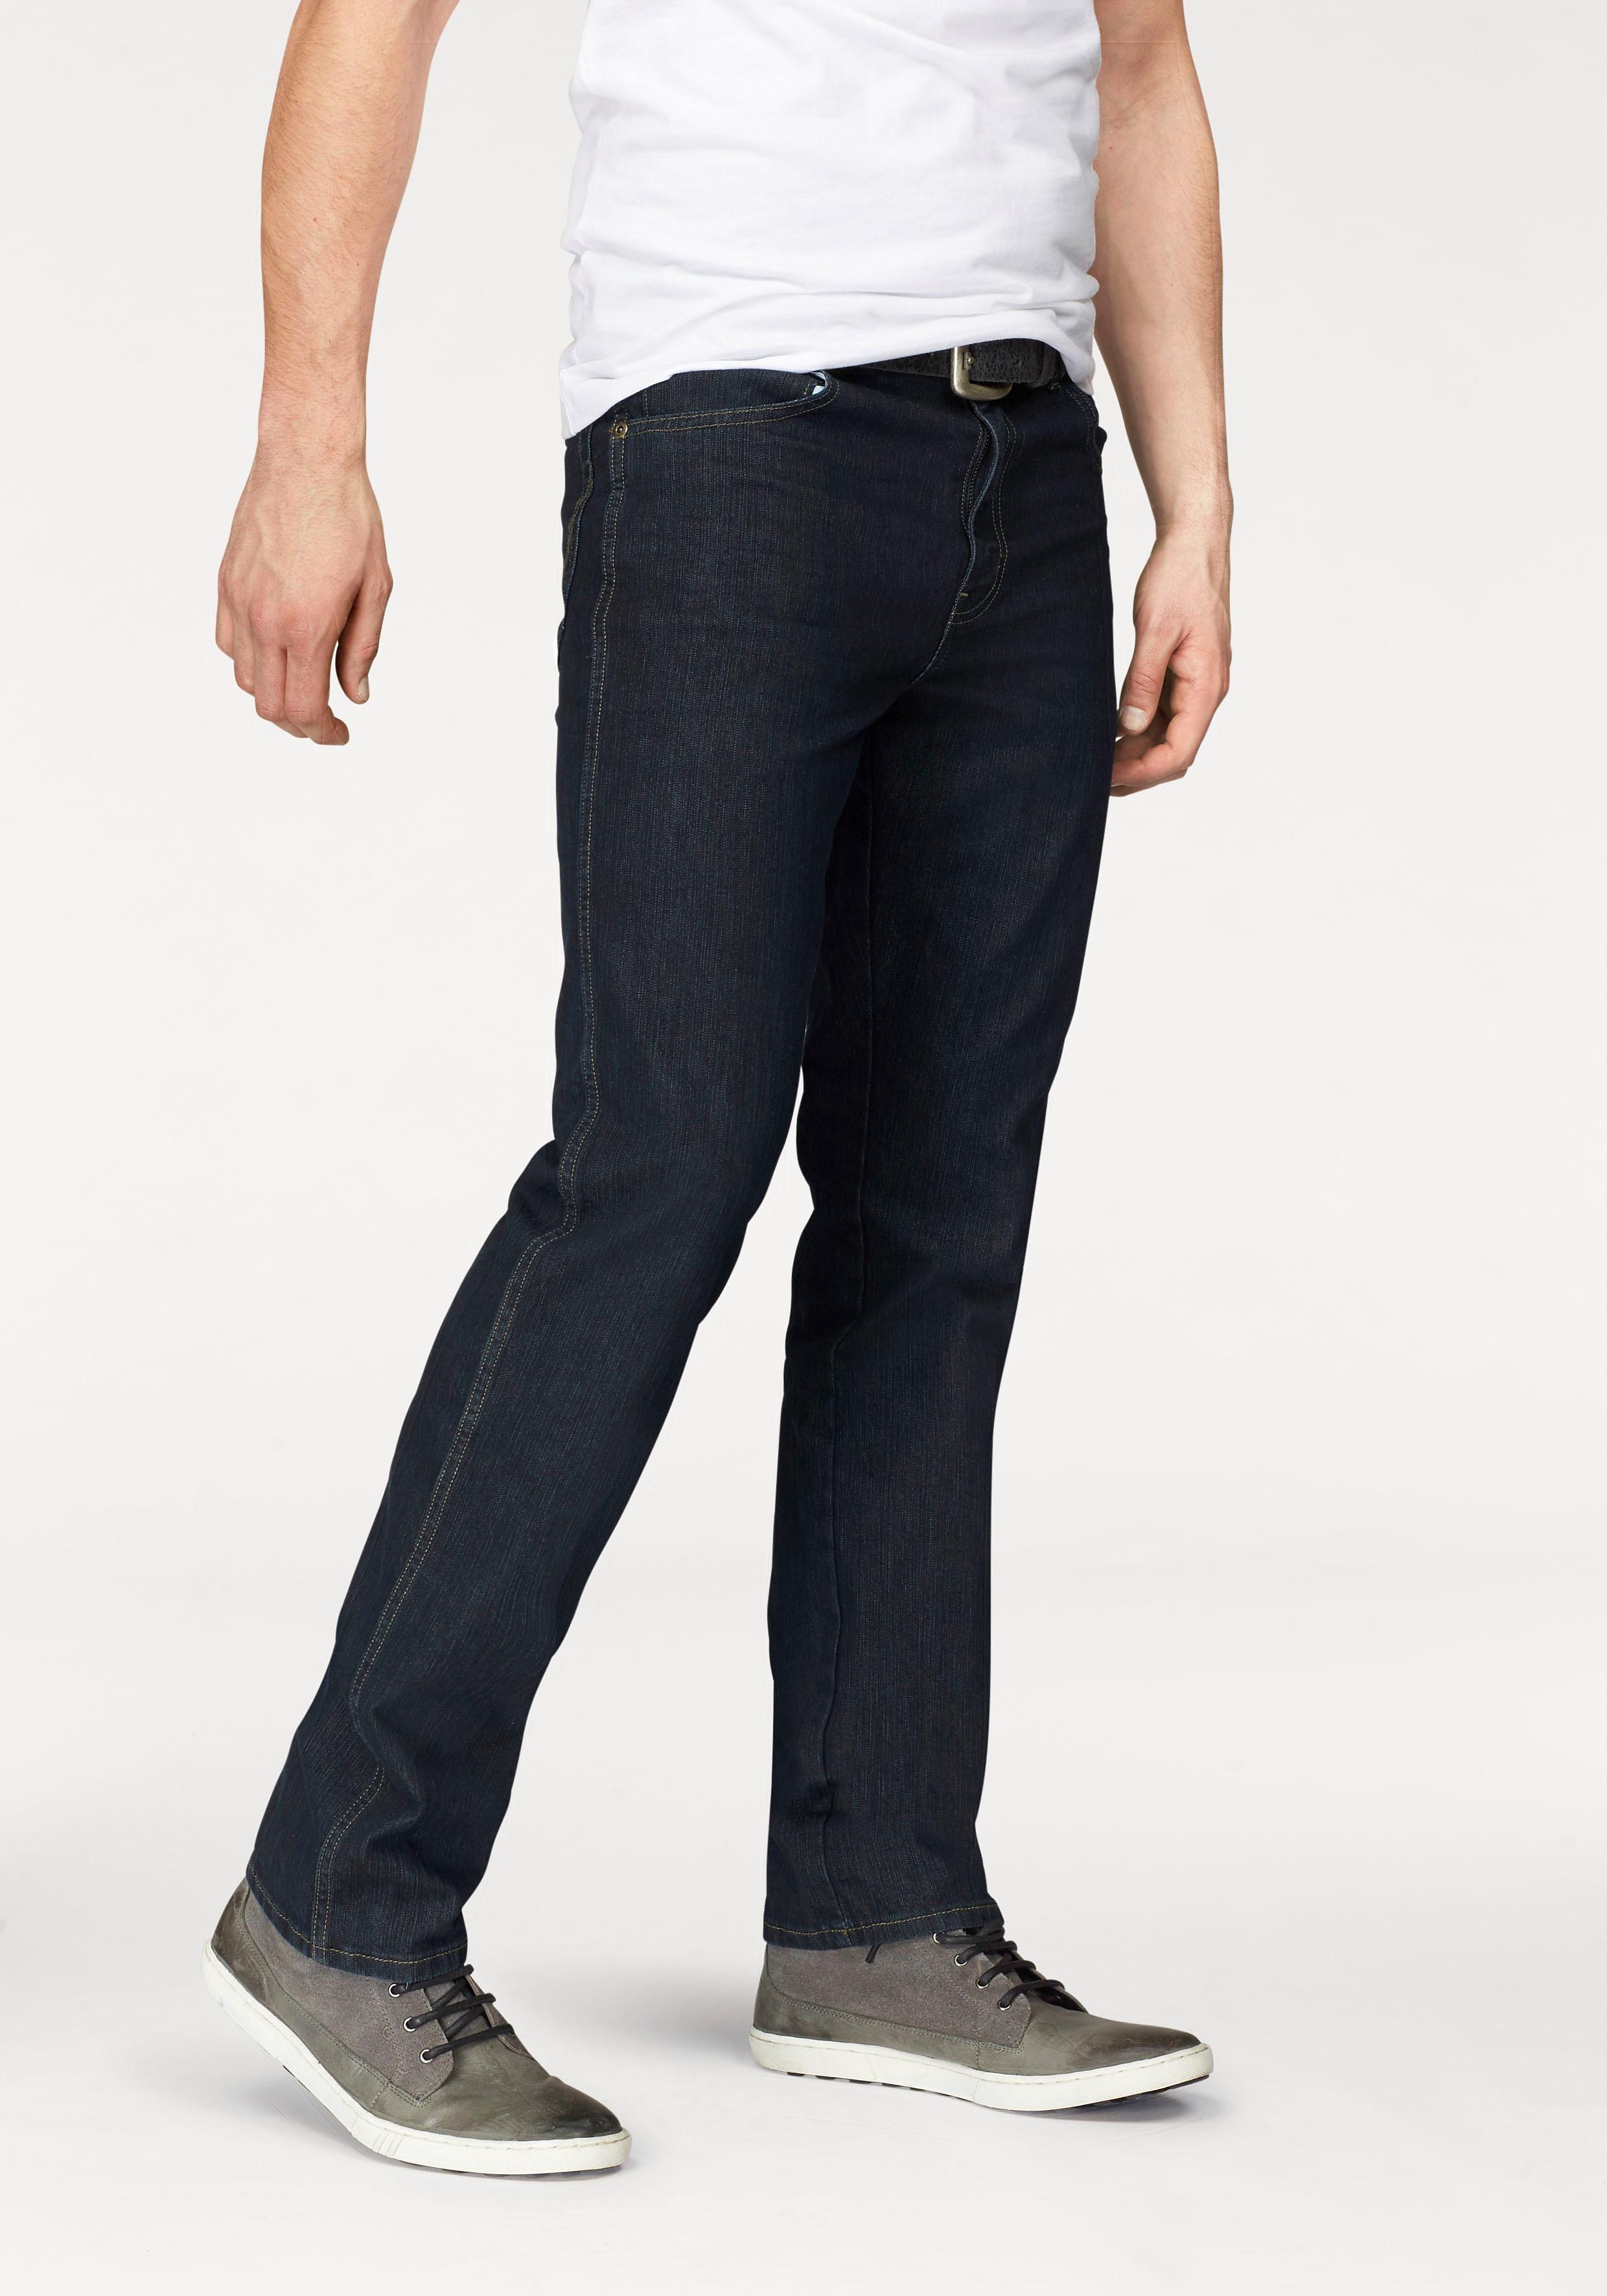 Regular jeans, stretch